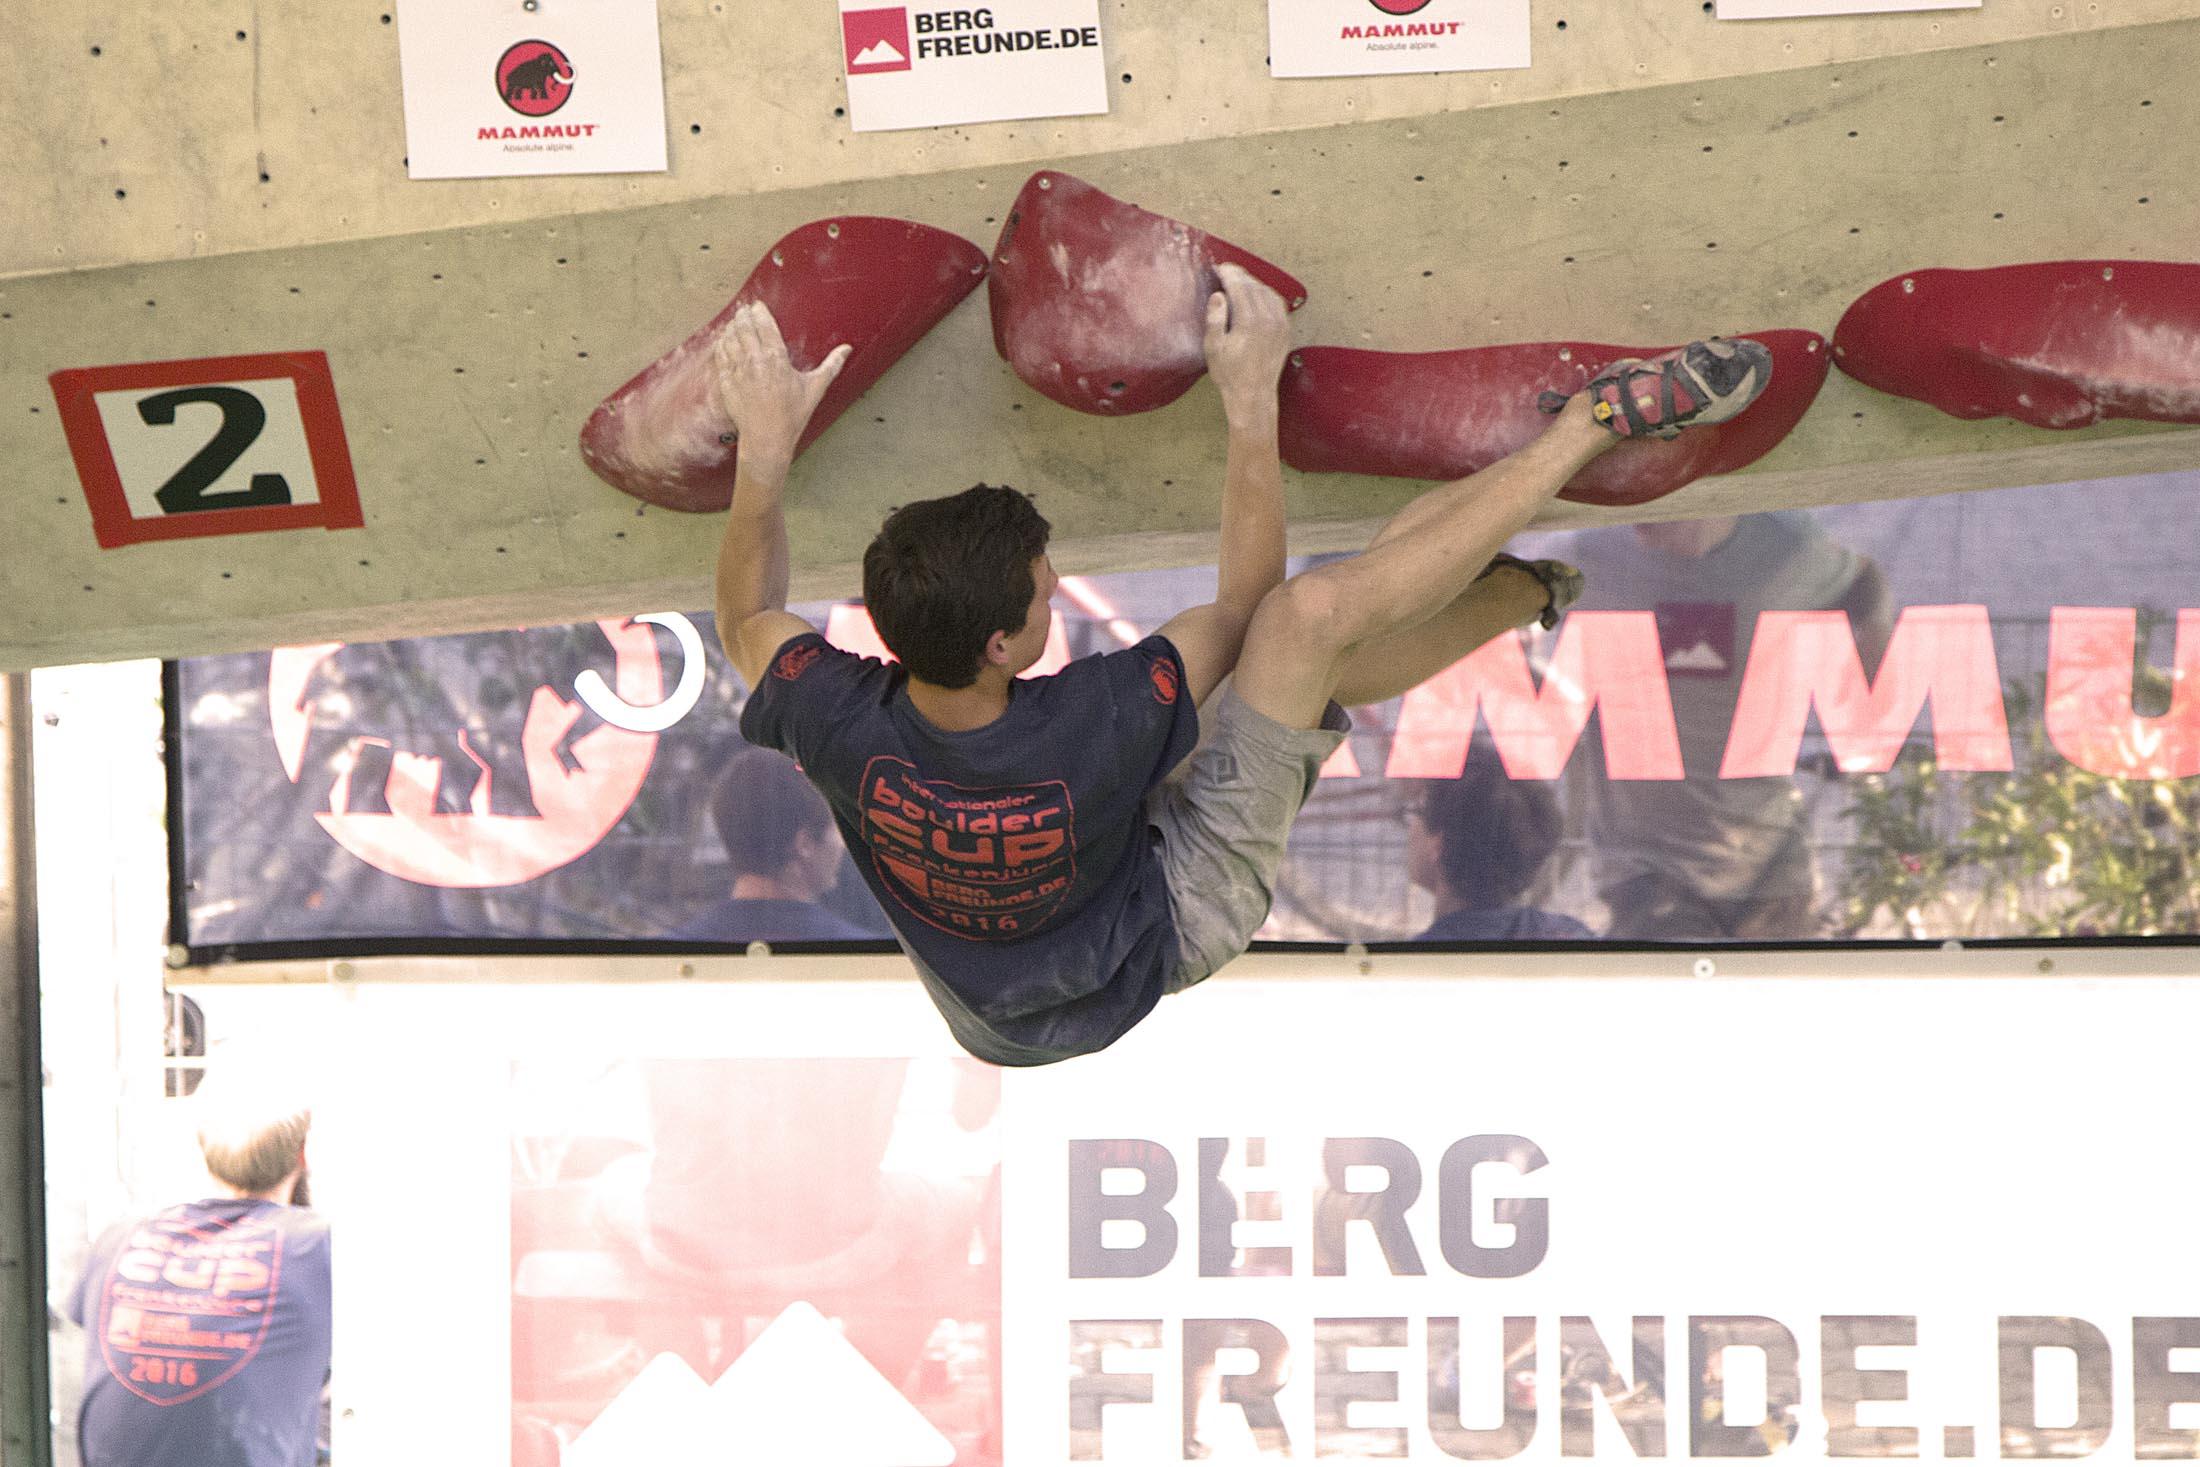 Finale, internationaler bouldercup Frankenjura 2016, BLOCKHELDEN Erlangen, Mammut, Bergfreunde.de, Boulderwettkampf07092016582